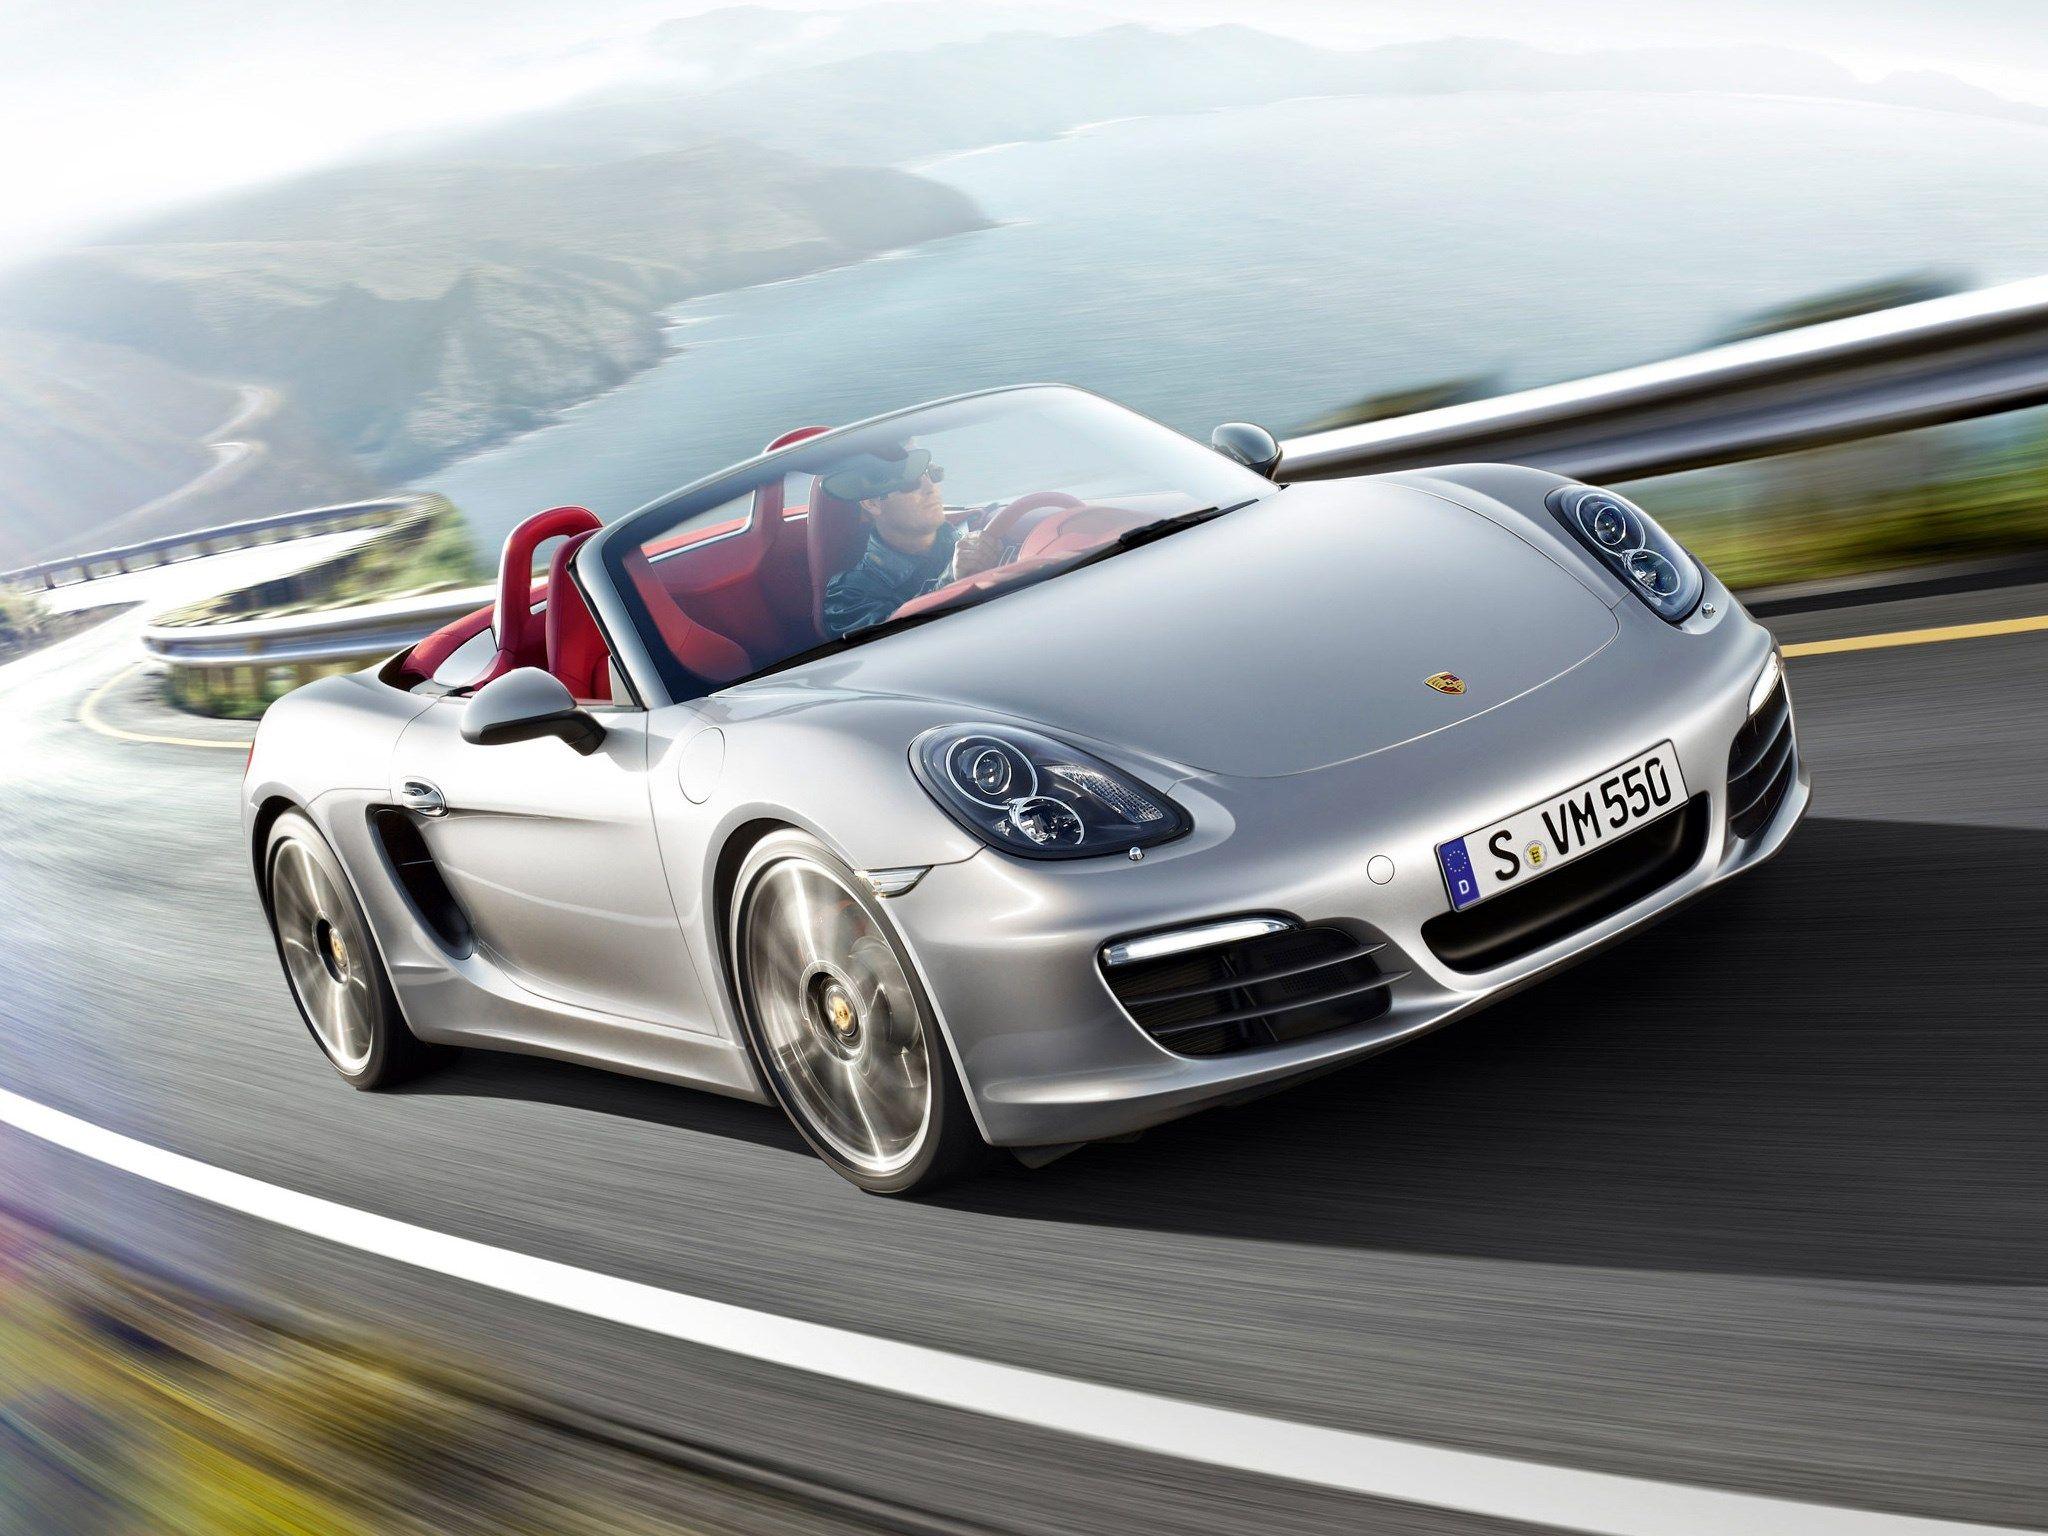 Porsche High Definition Background Car Dealership